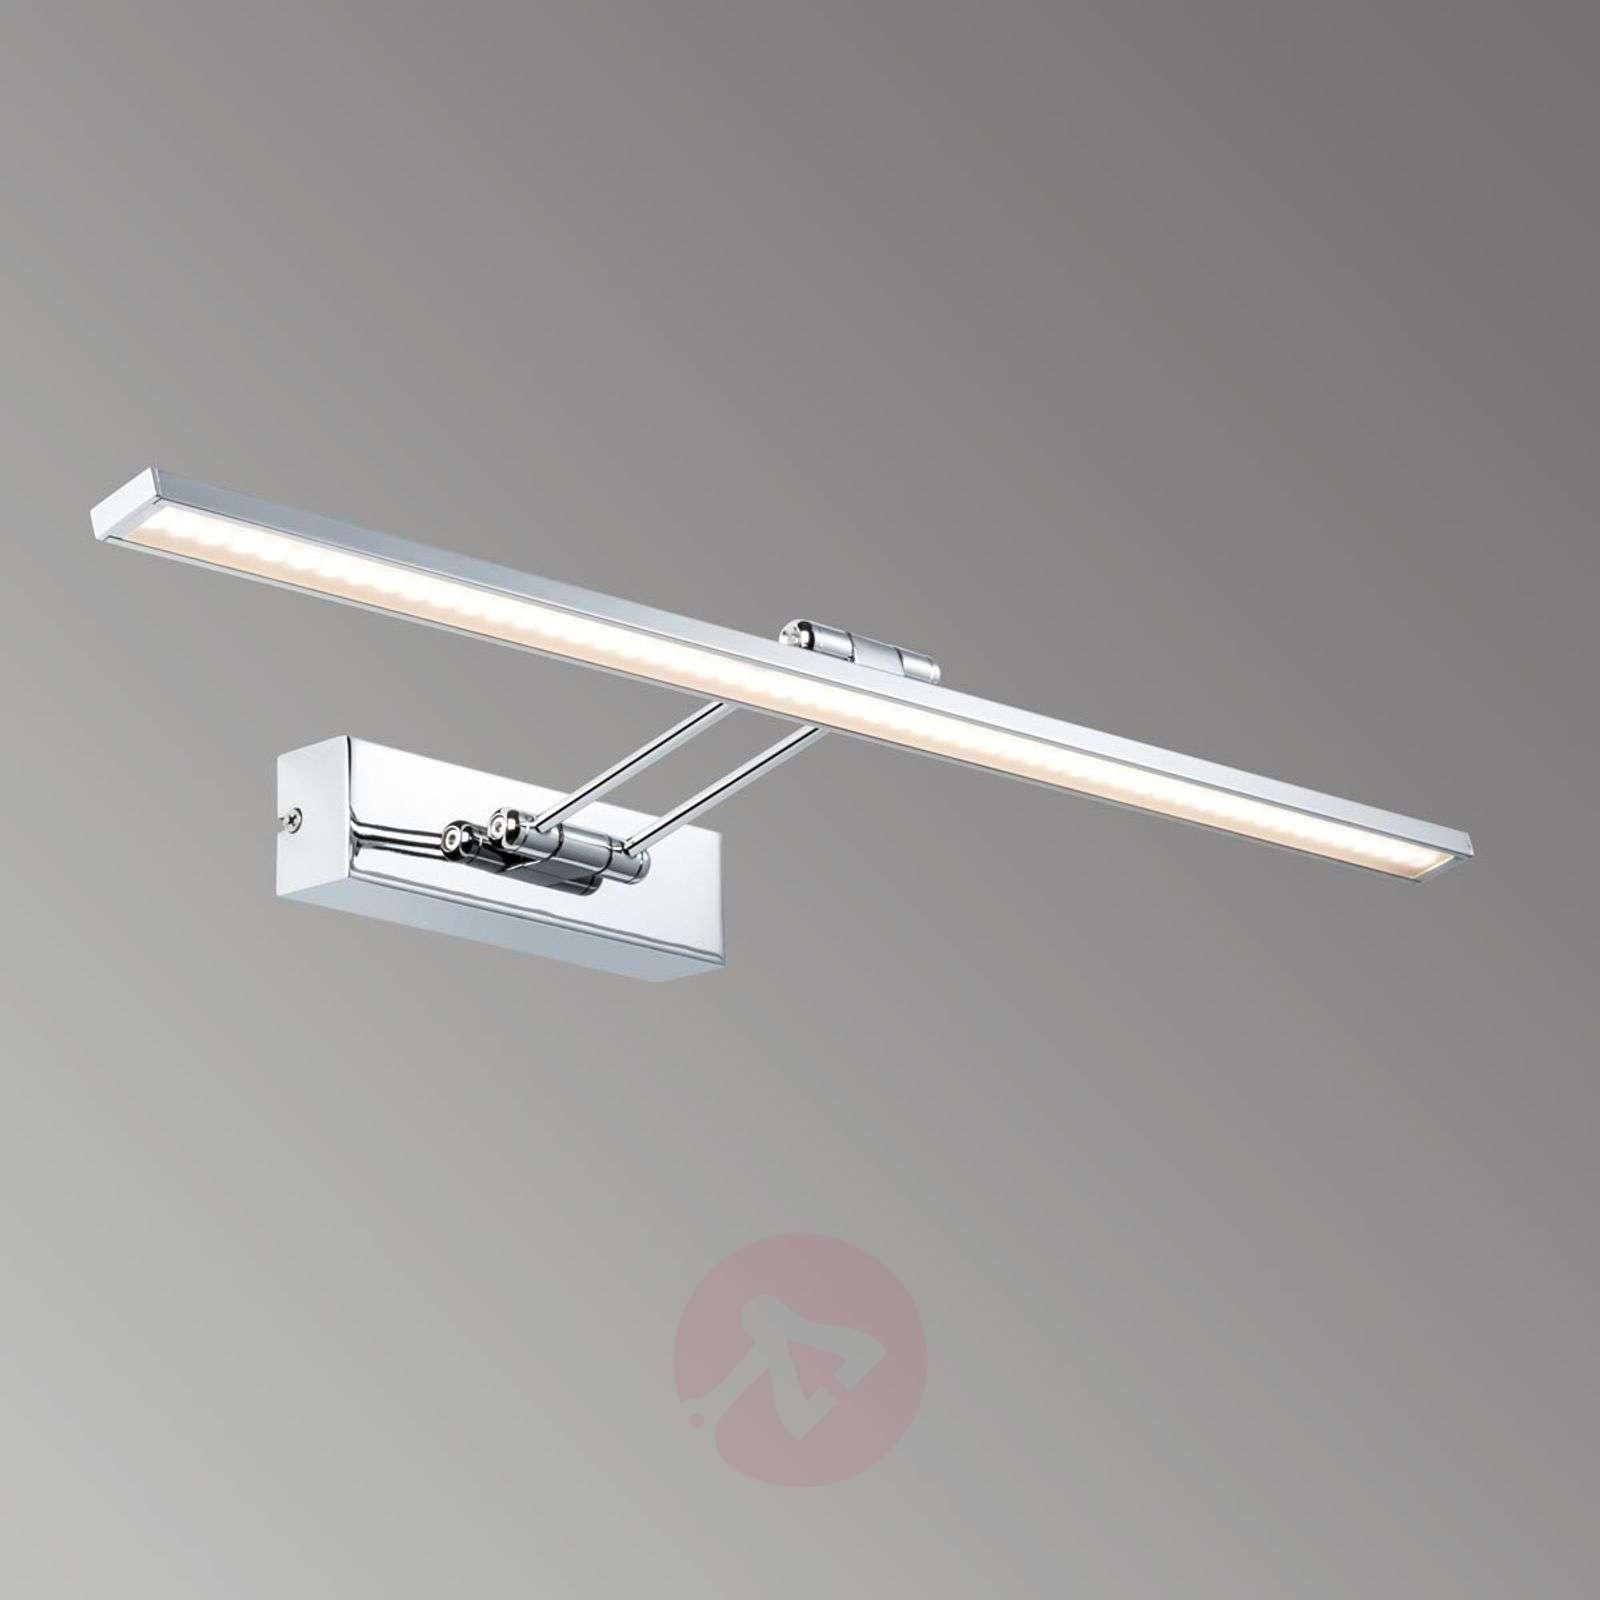 Kromattu Galeria LED-tauluvalaisin Beam Sixty-7600780-01